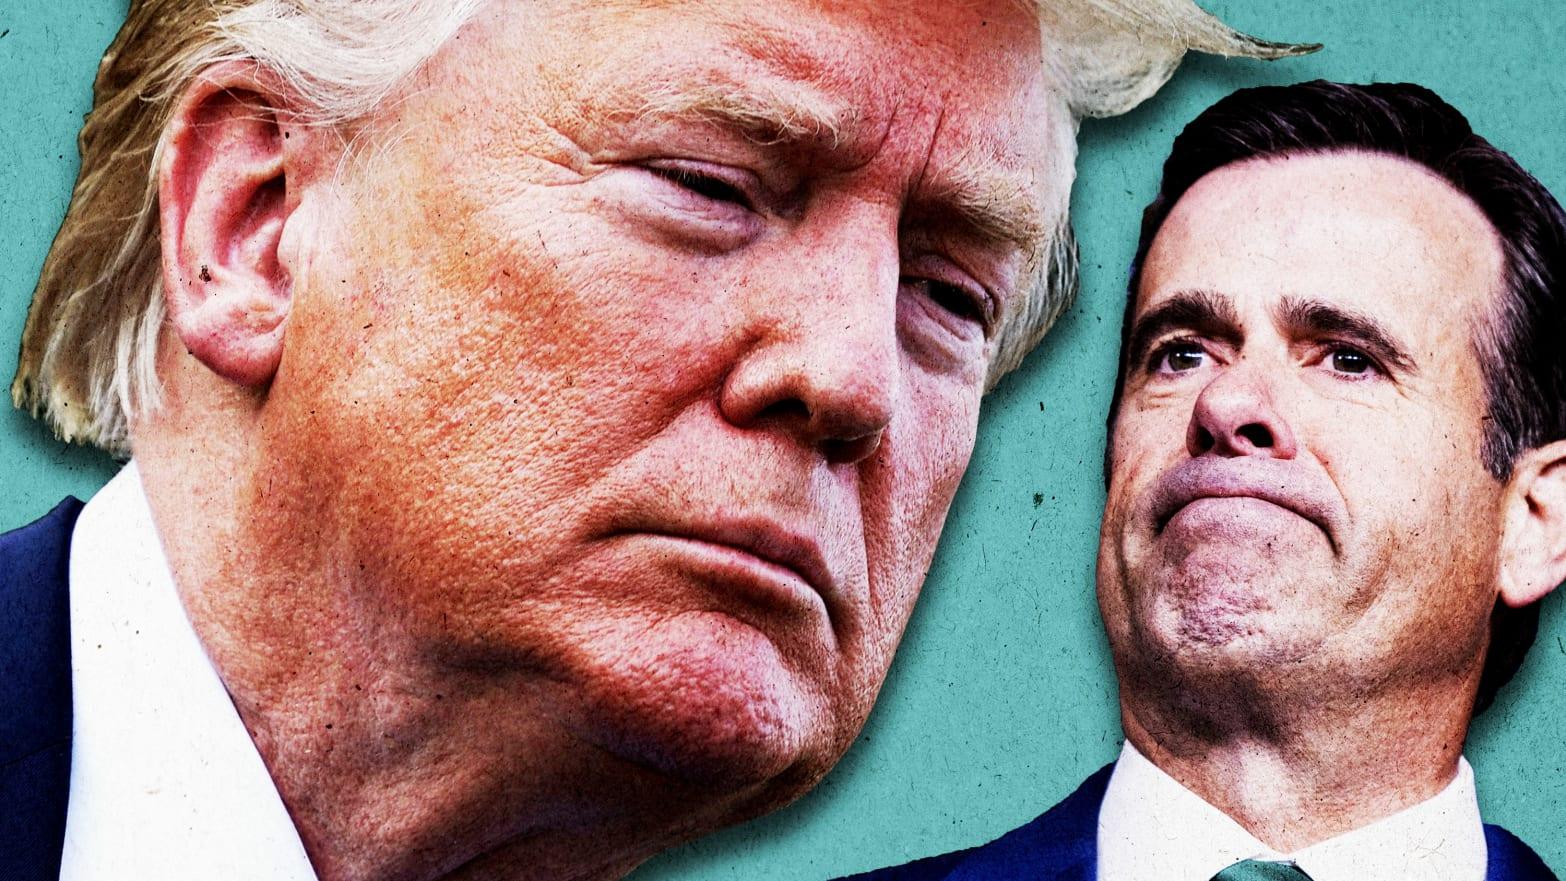 John Ratcliffe (R-Loser) Gets the Full Trump Treatment